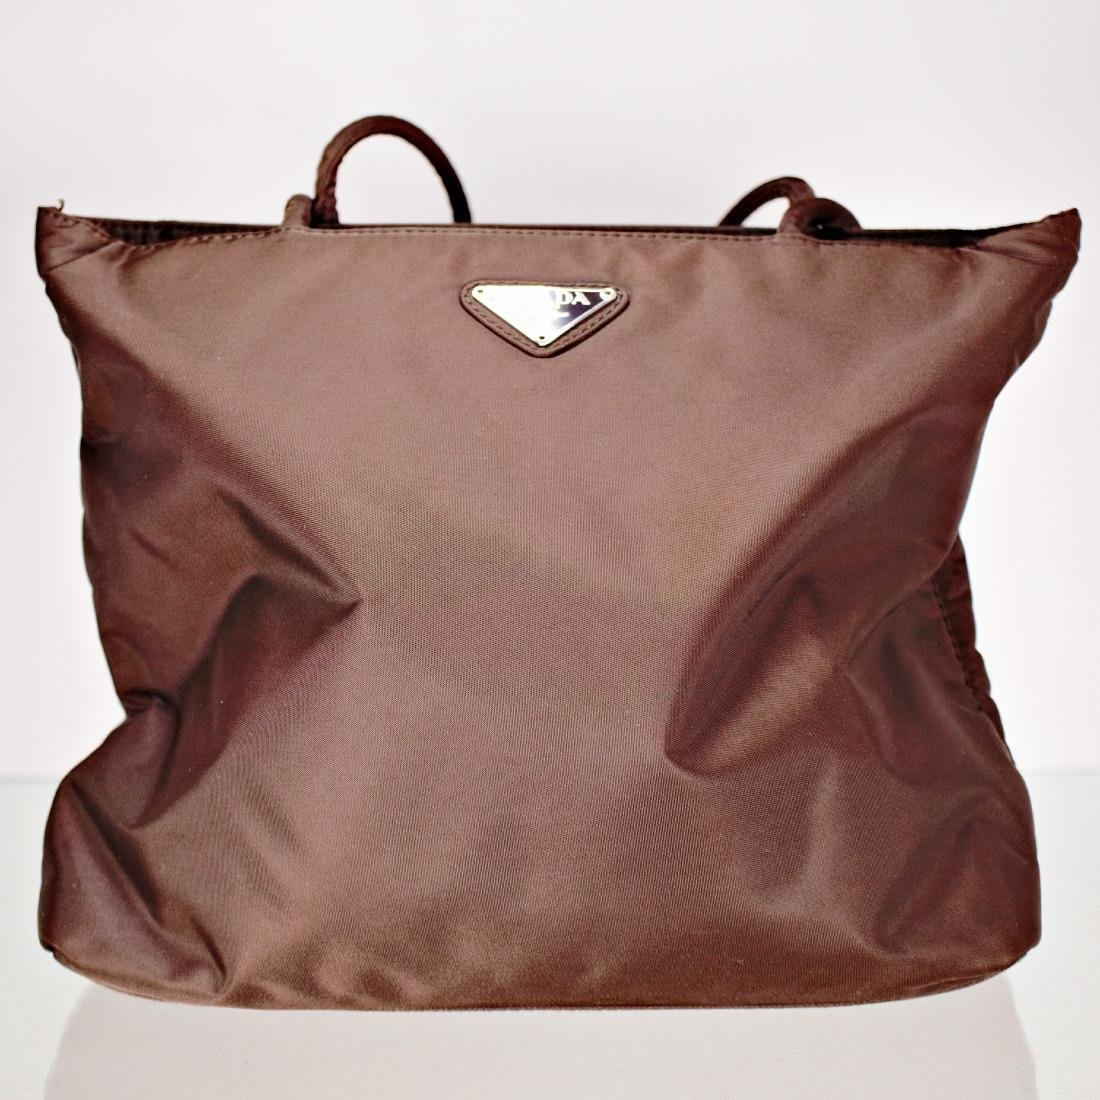 Chocolate Nylon Prada Bag